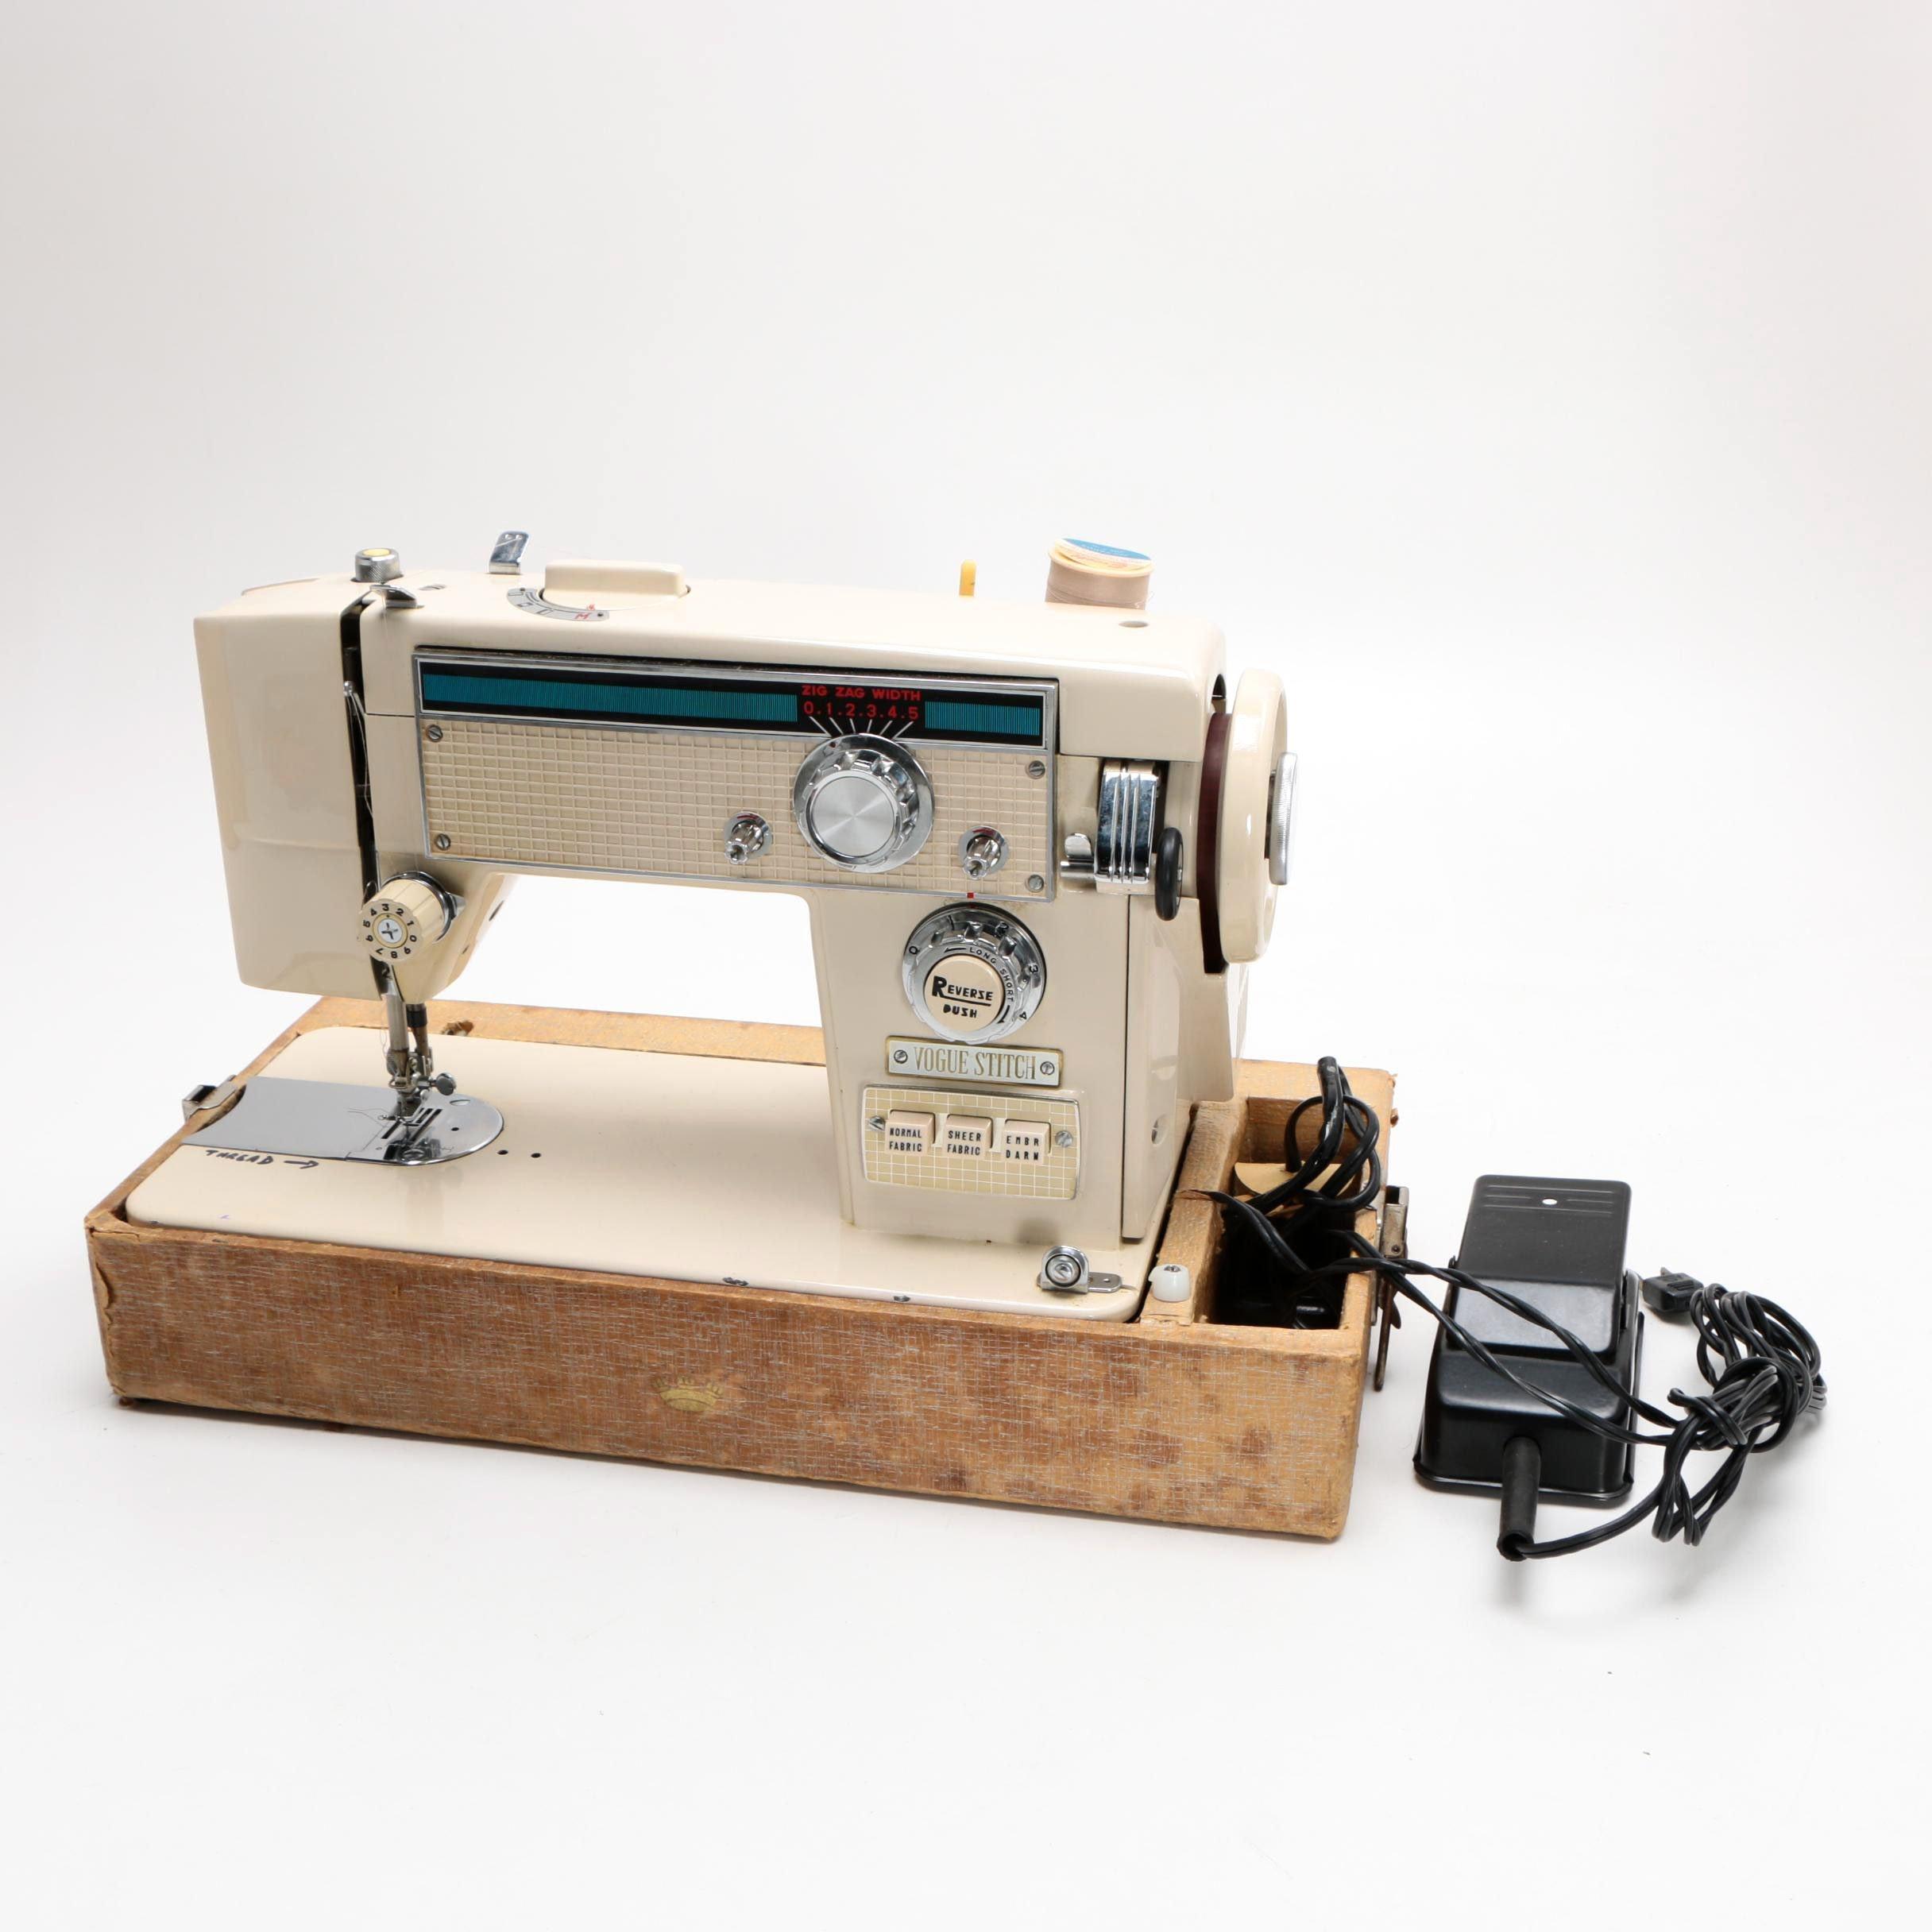 Circa 1960s Japanese Vogue Stitch Zig-Zag Portable Sewing Machine